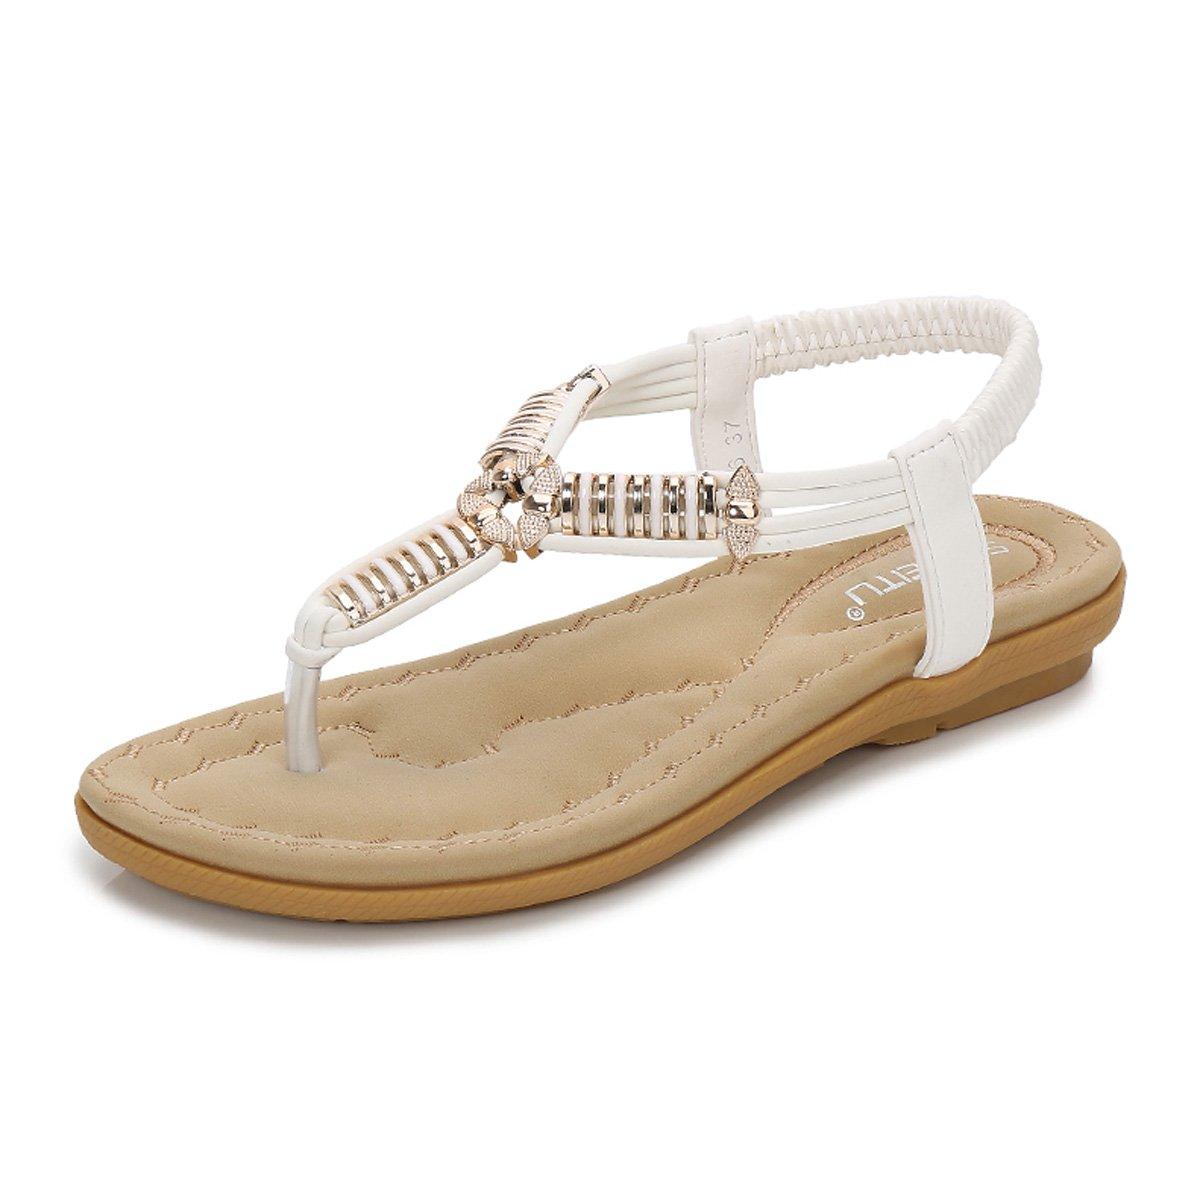 gracosy Damen Sandalen, Flip Flops Sommer Sandals Flach Zehentrenner T-Strap Offen Bouml;hmische Strand Schuhe  38 EU Wei?